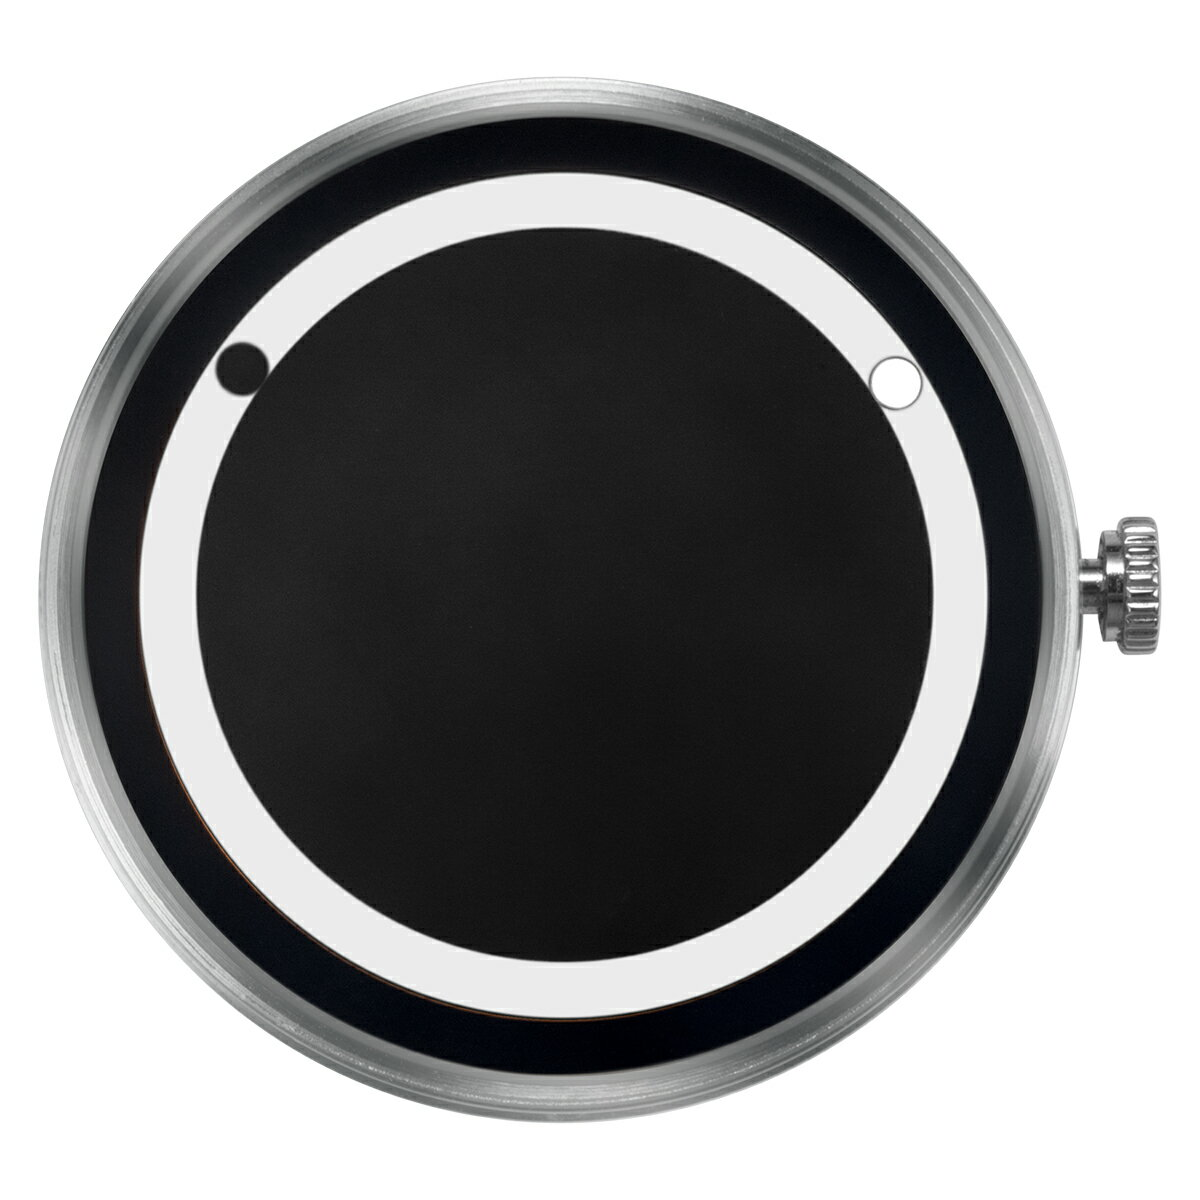 ZEROO 交換用クロックボディ ZEROO PLANET ECLIPSE ゼロ 電池式クォーツ 腕時計 [M13030]